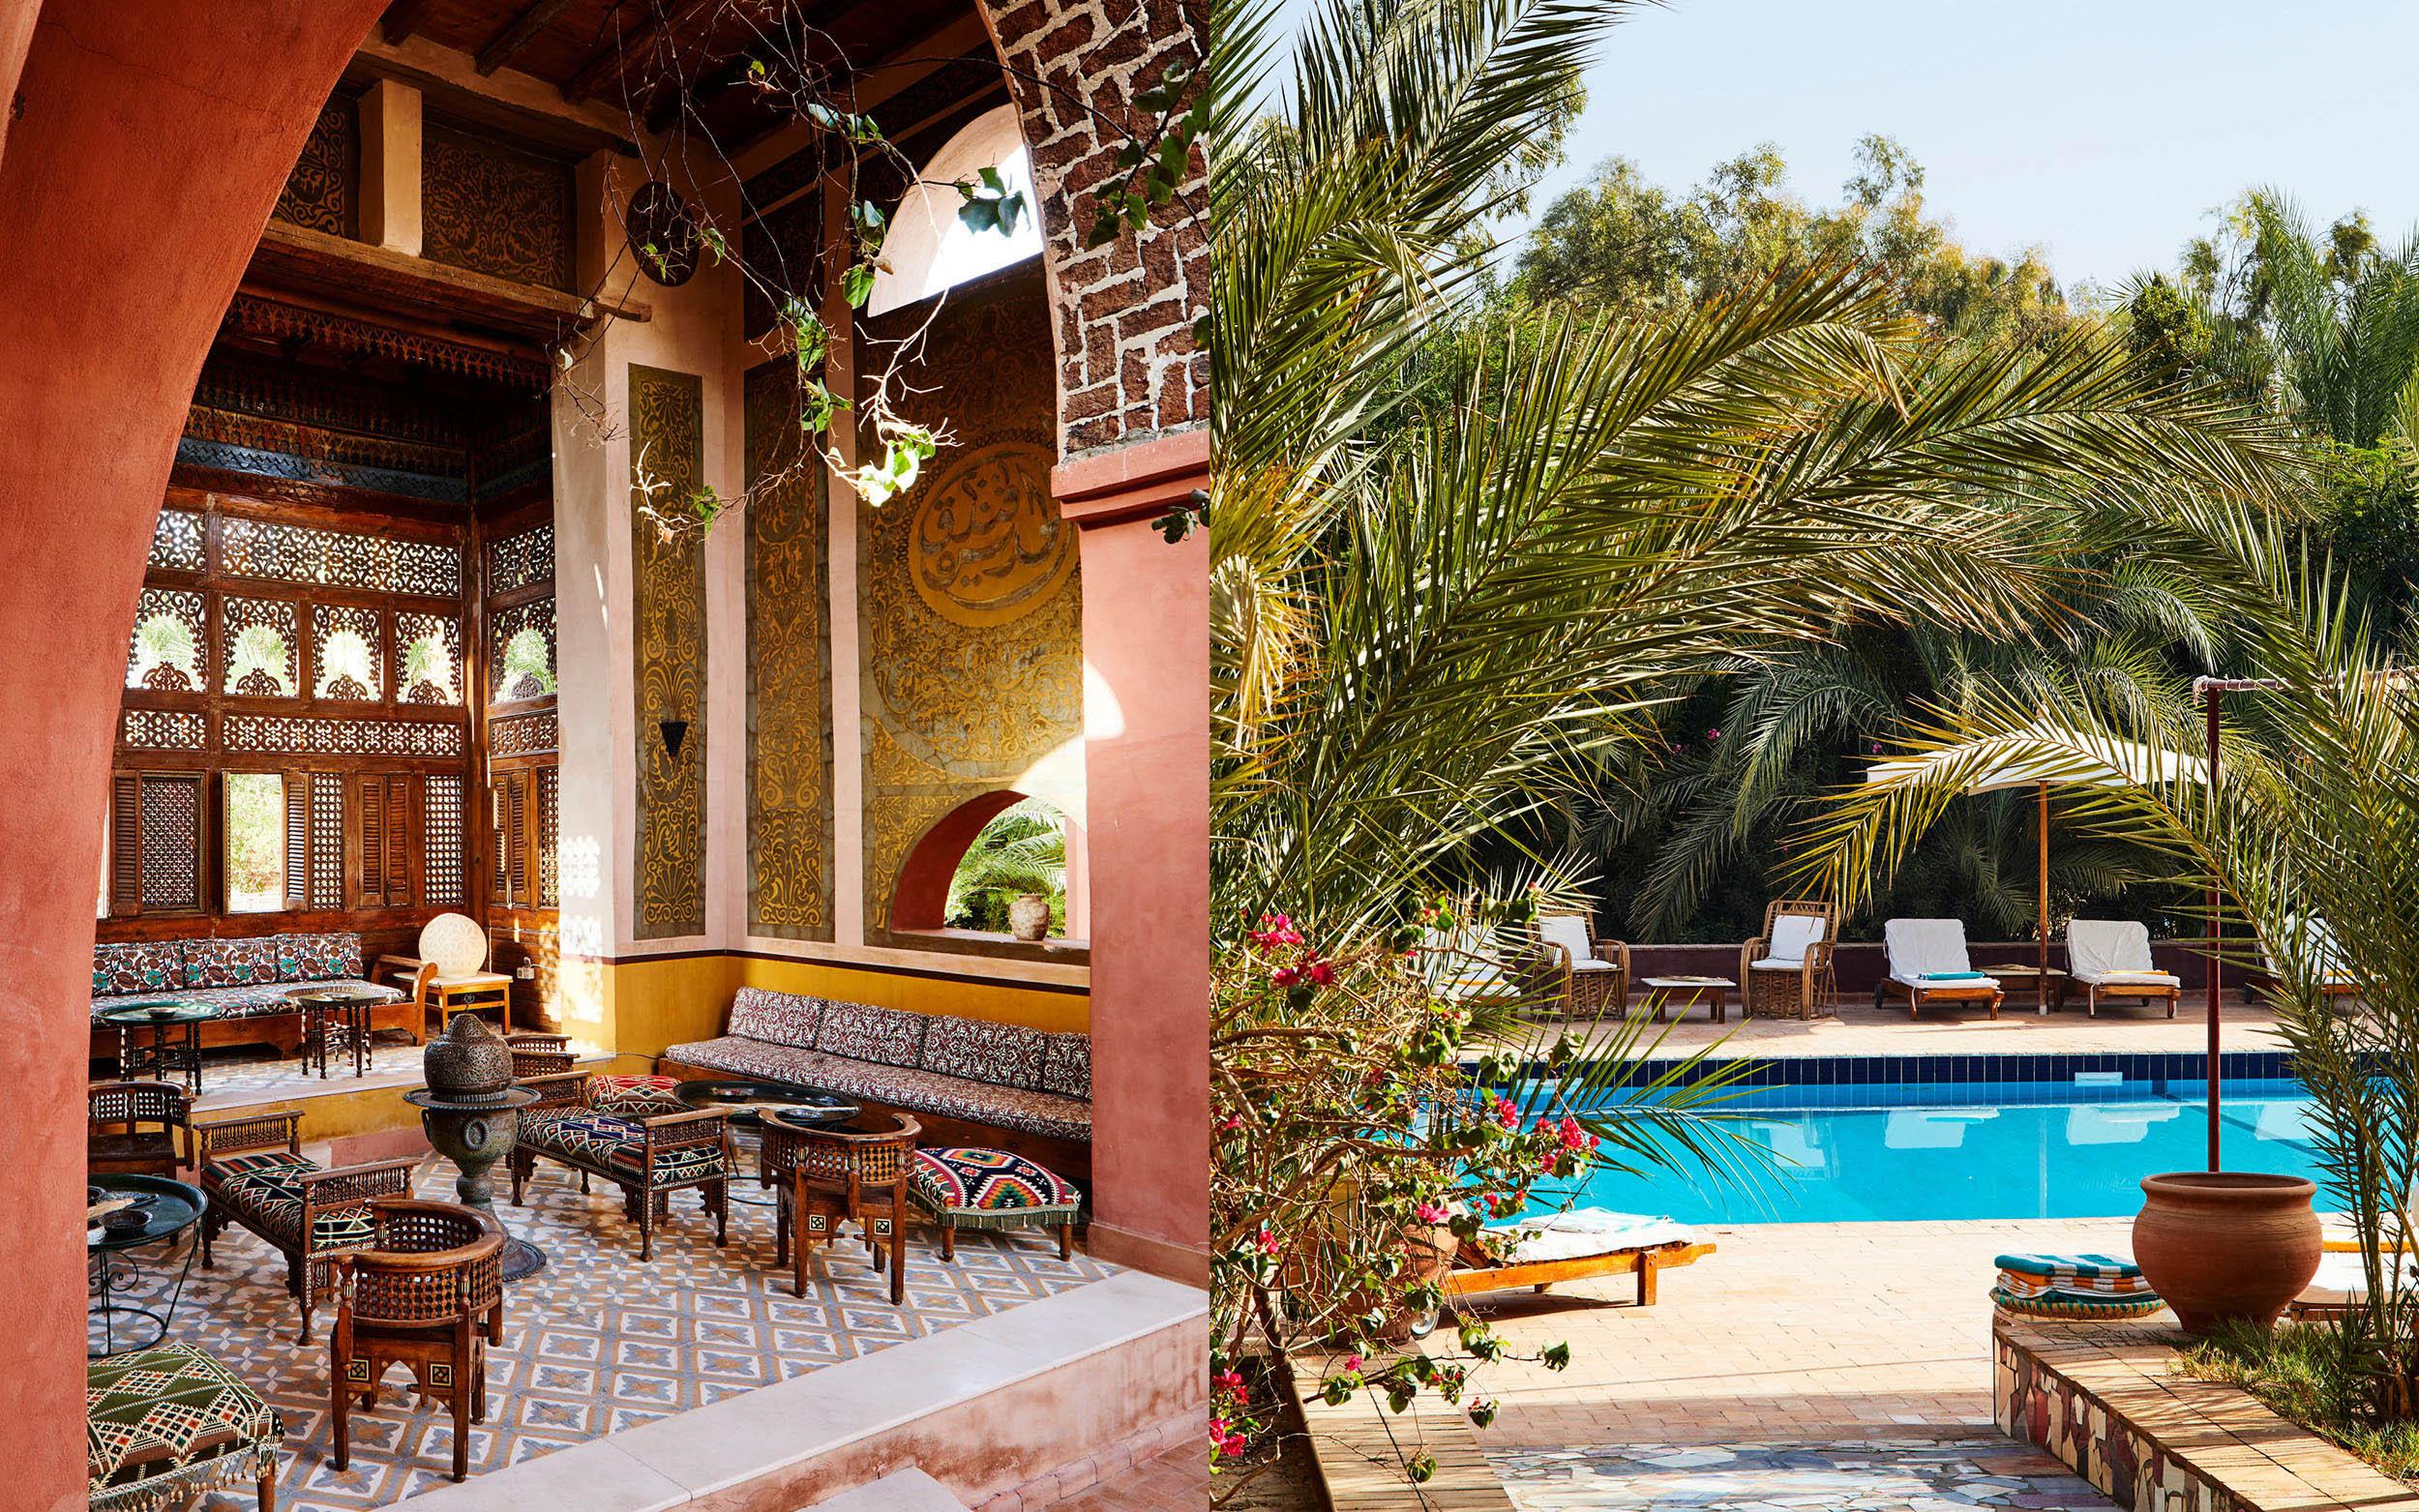 1726_Hotel_Al_Moudira_187.jpg